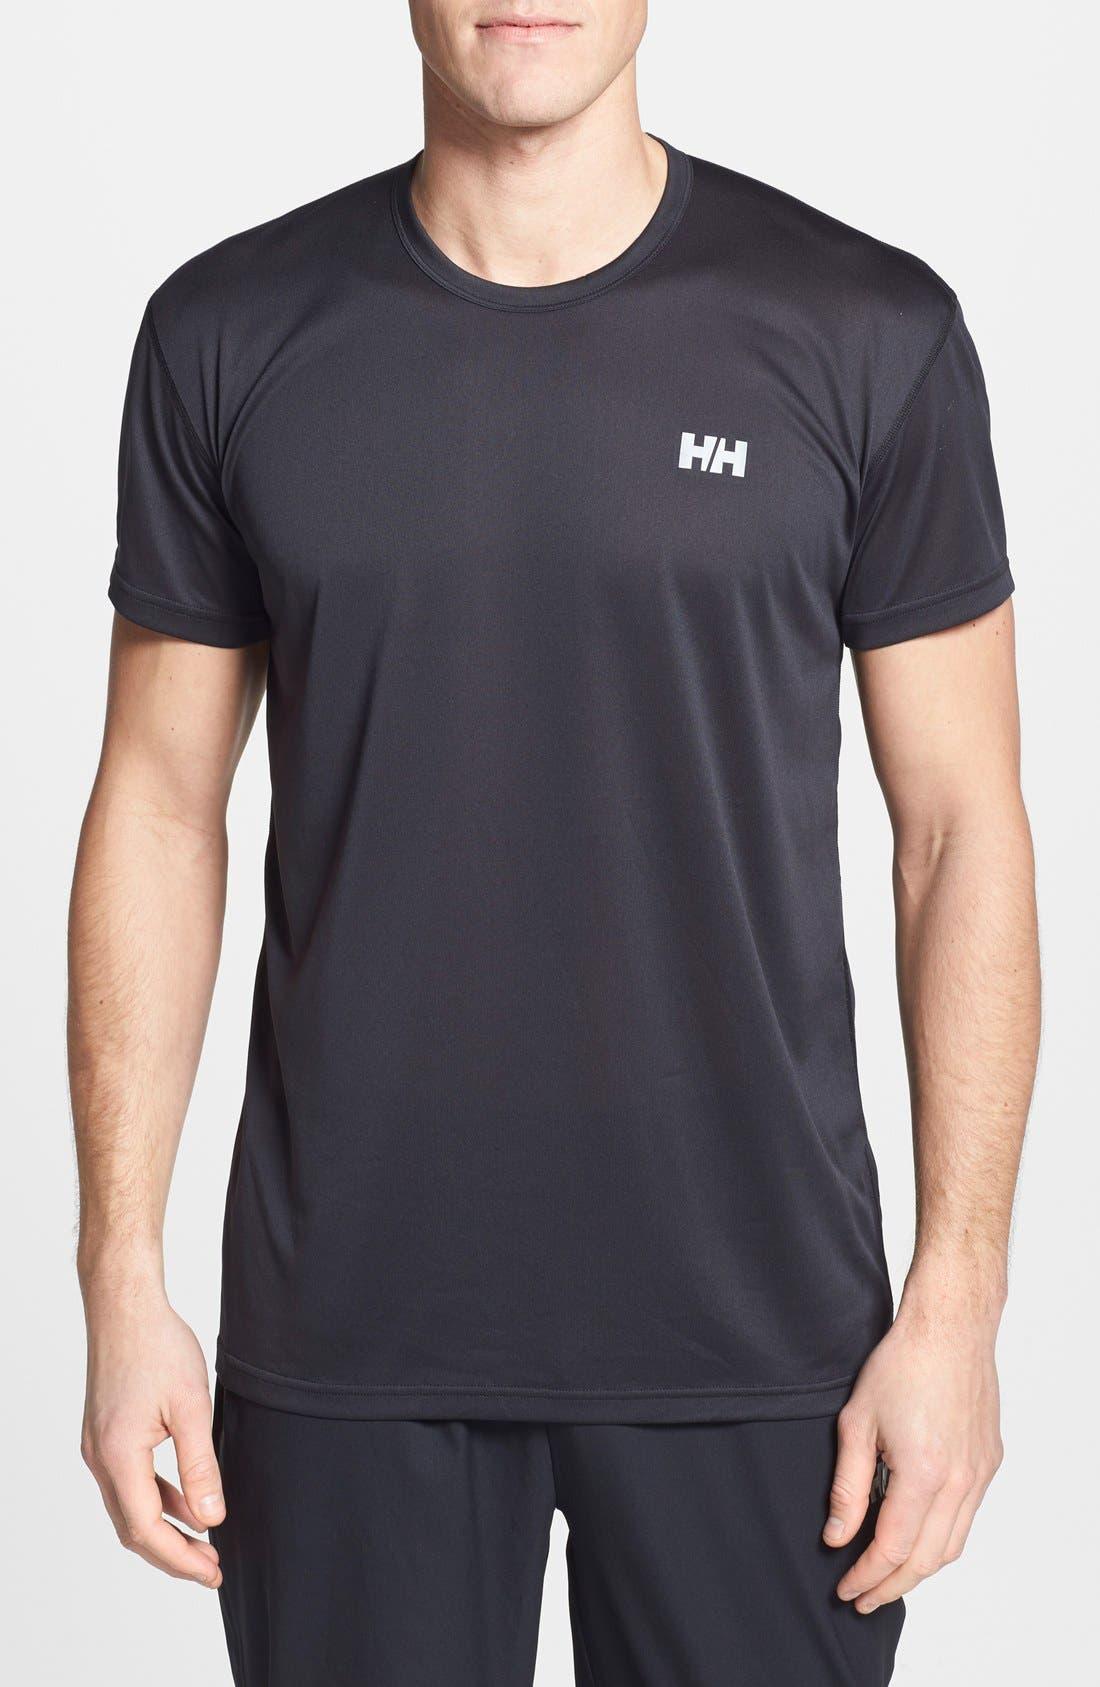 HELLY HANSEN,                             'VTR' Quick Dry T-Shirt,                             Main thumbnail 1, color,                             001